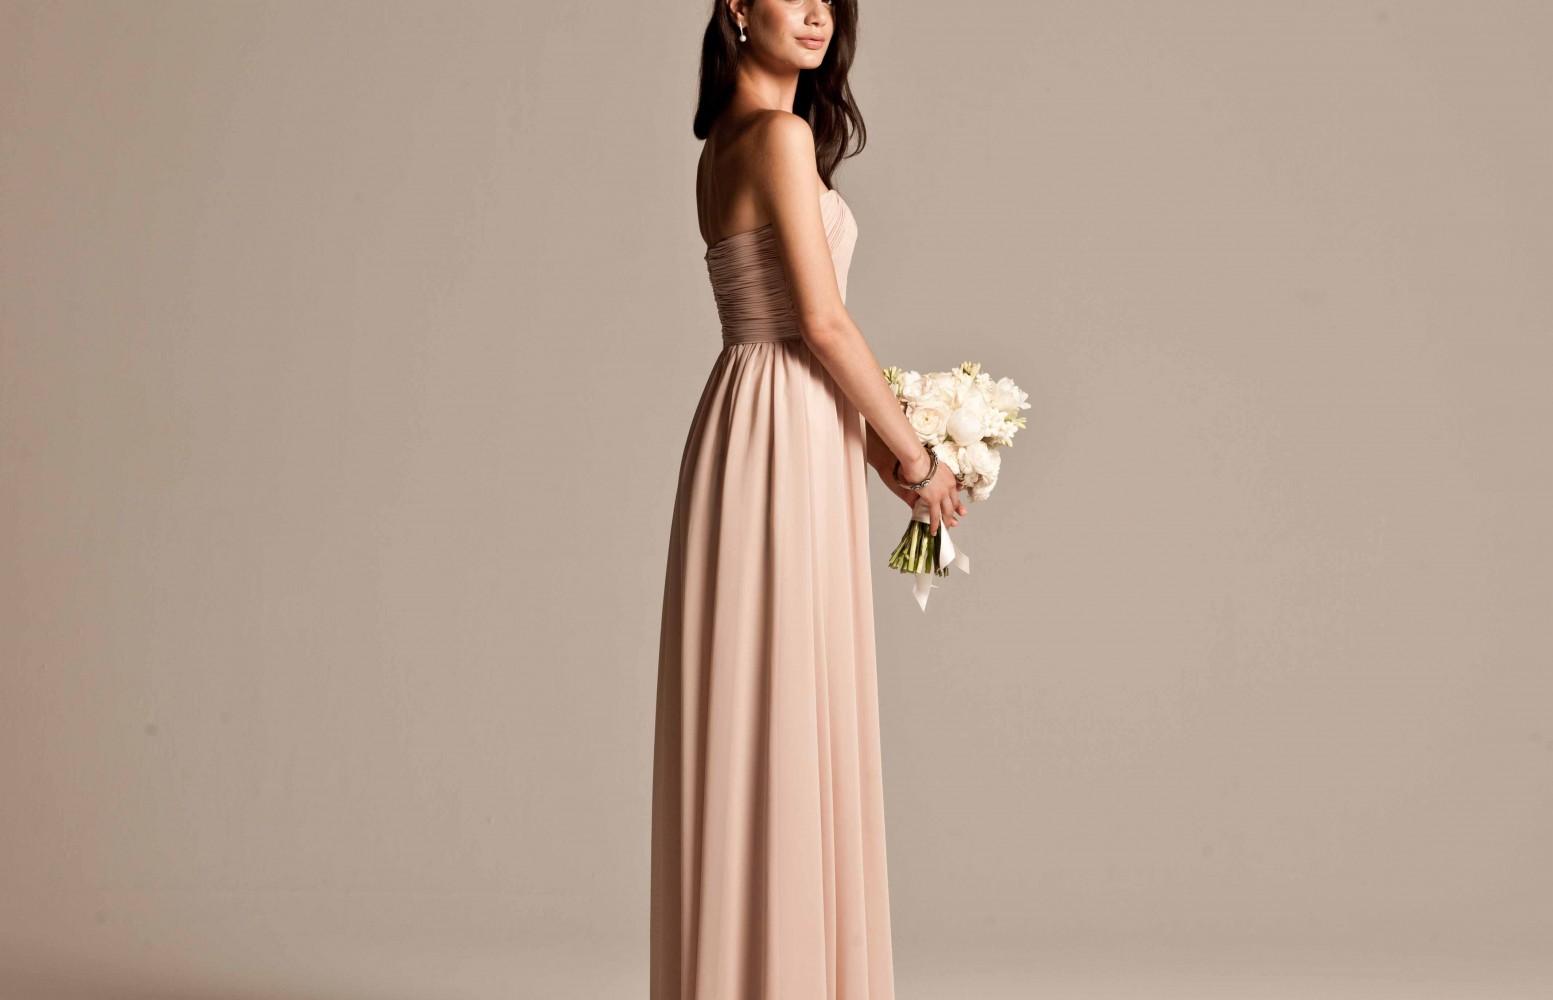 Beige bridesmaid dresses australia beige bridesmaids dresses online ombrellifo Choice Image